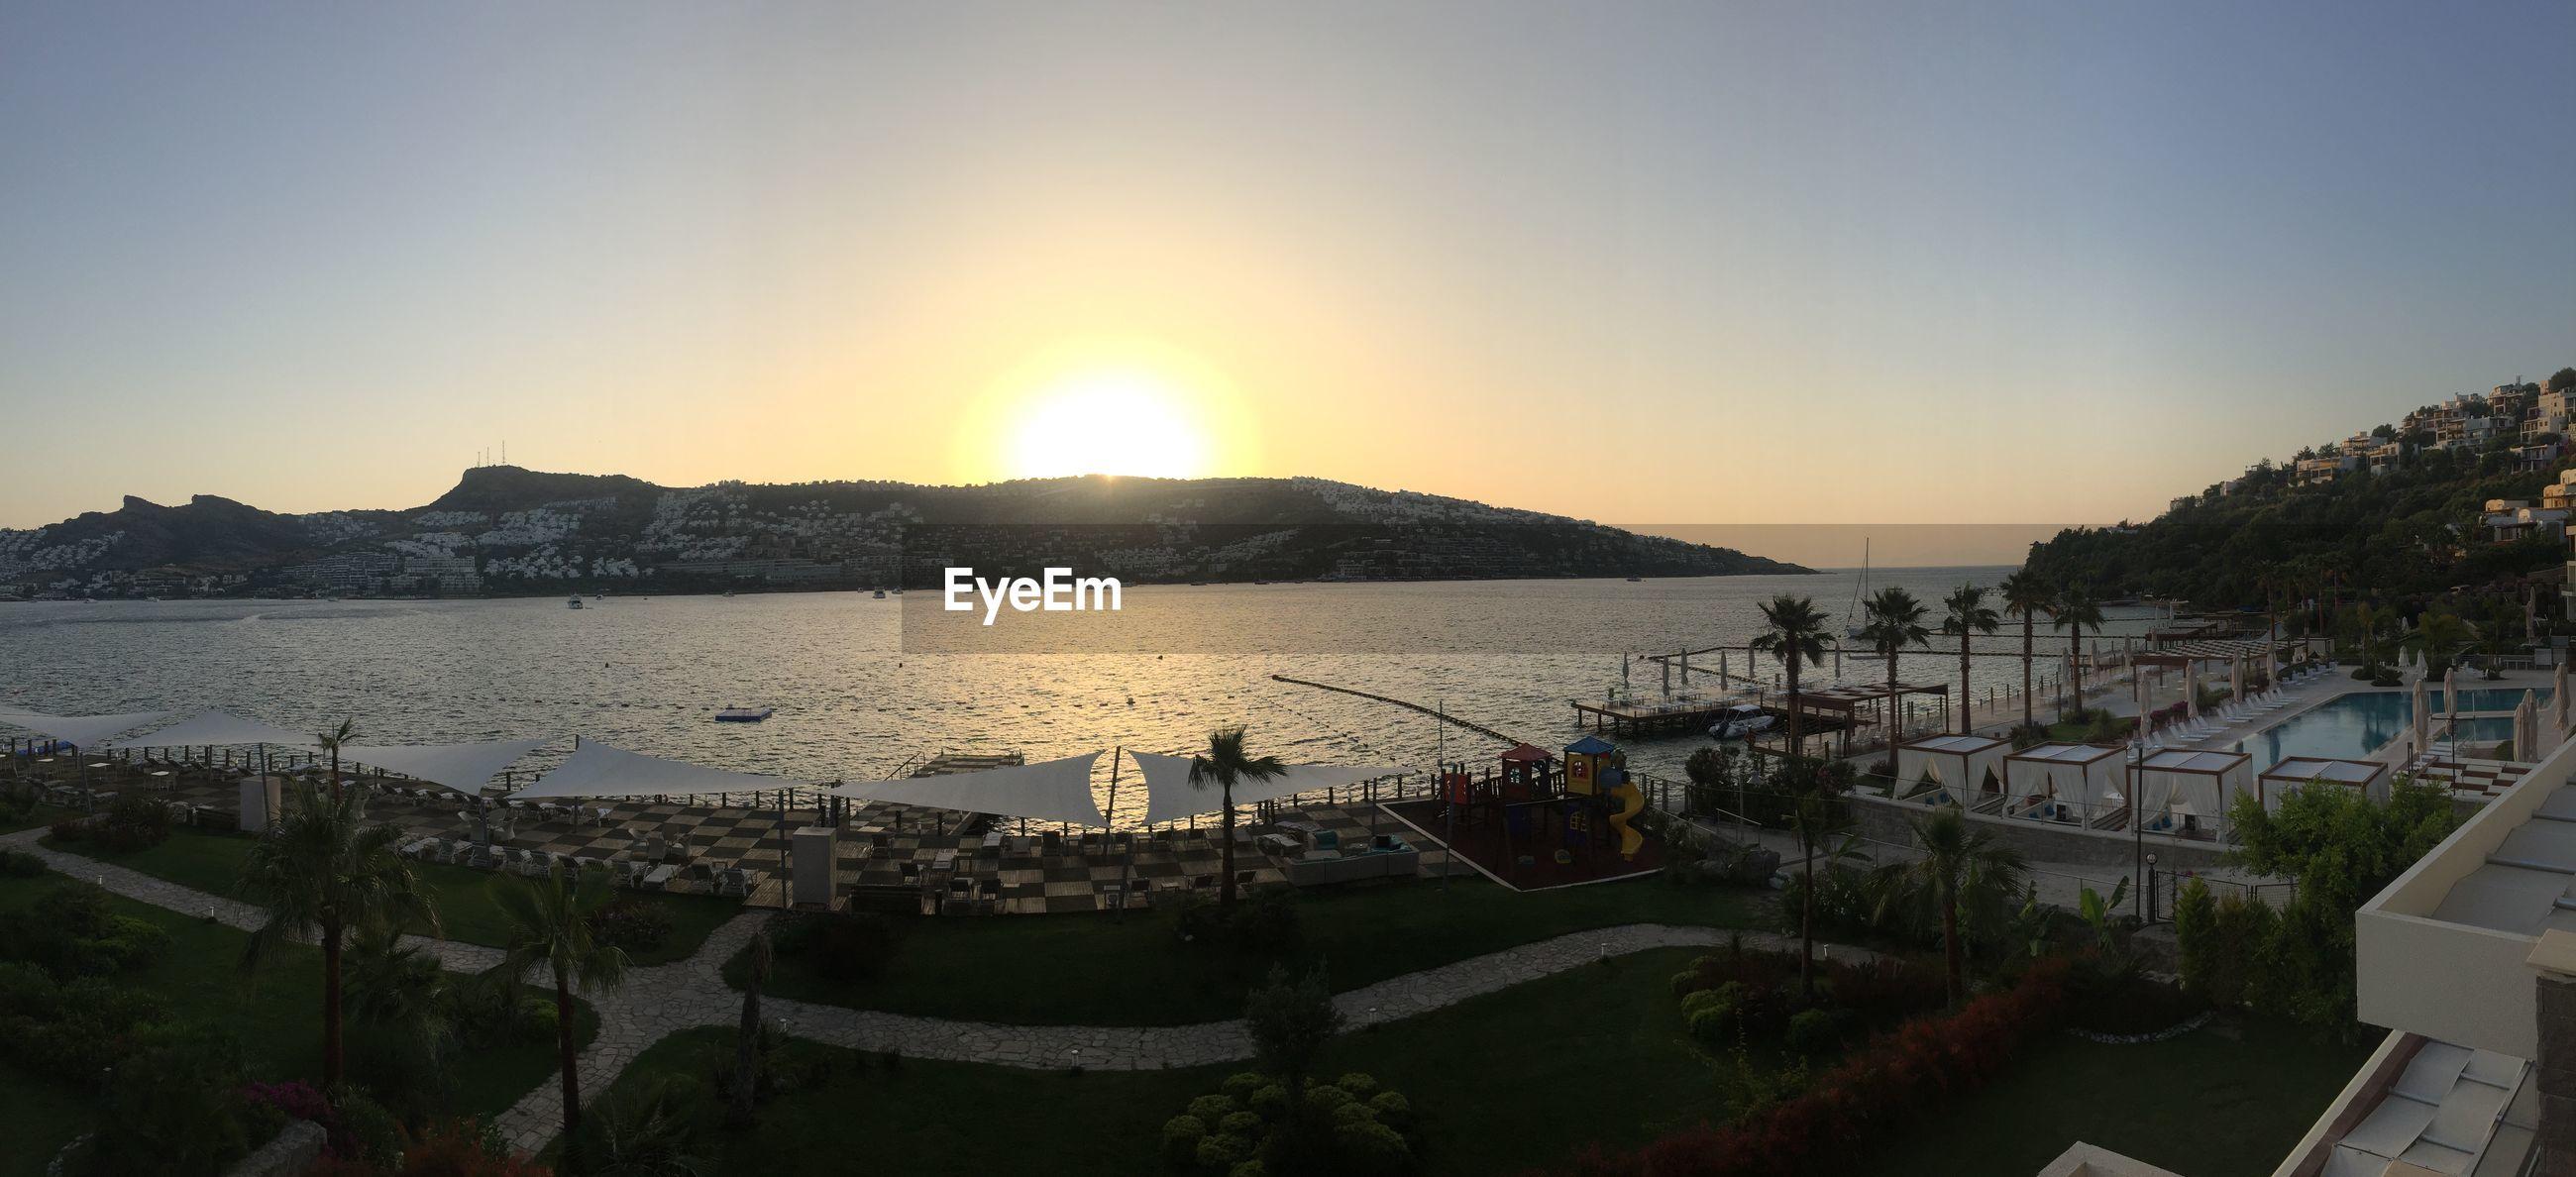 sun, sunset, water, clear sky, tranquil scene, scenics, tranquility, sunlight, beauty in nature, sea, nature, copy space, mountain, idyllic, landscape, beach, sunbeam, sky, lake, outdoors